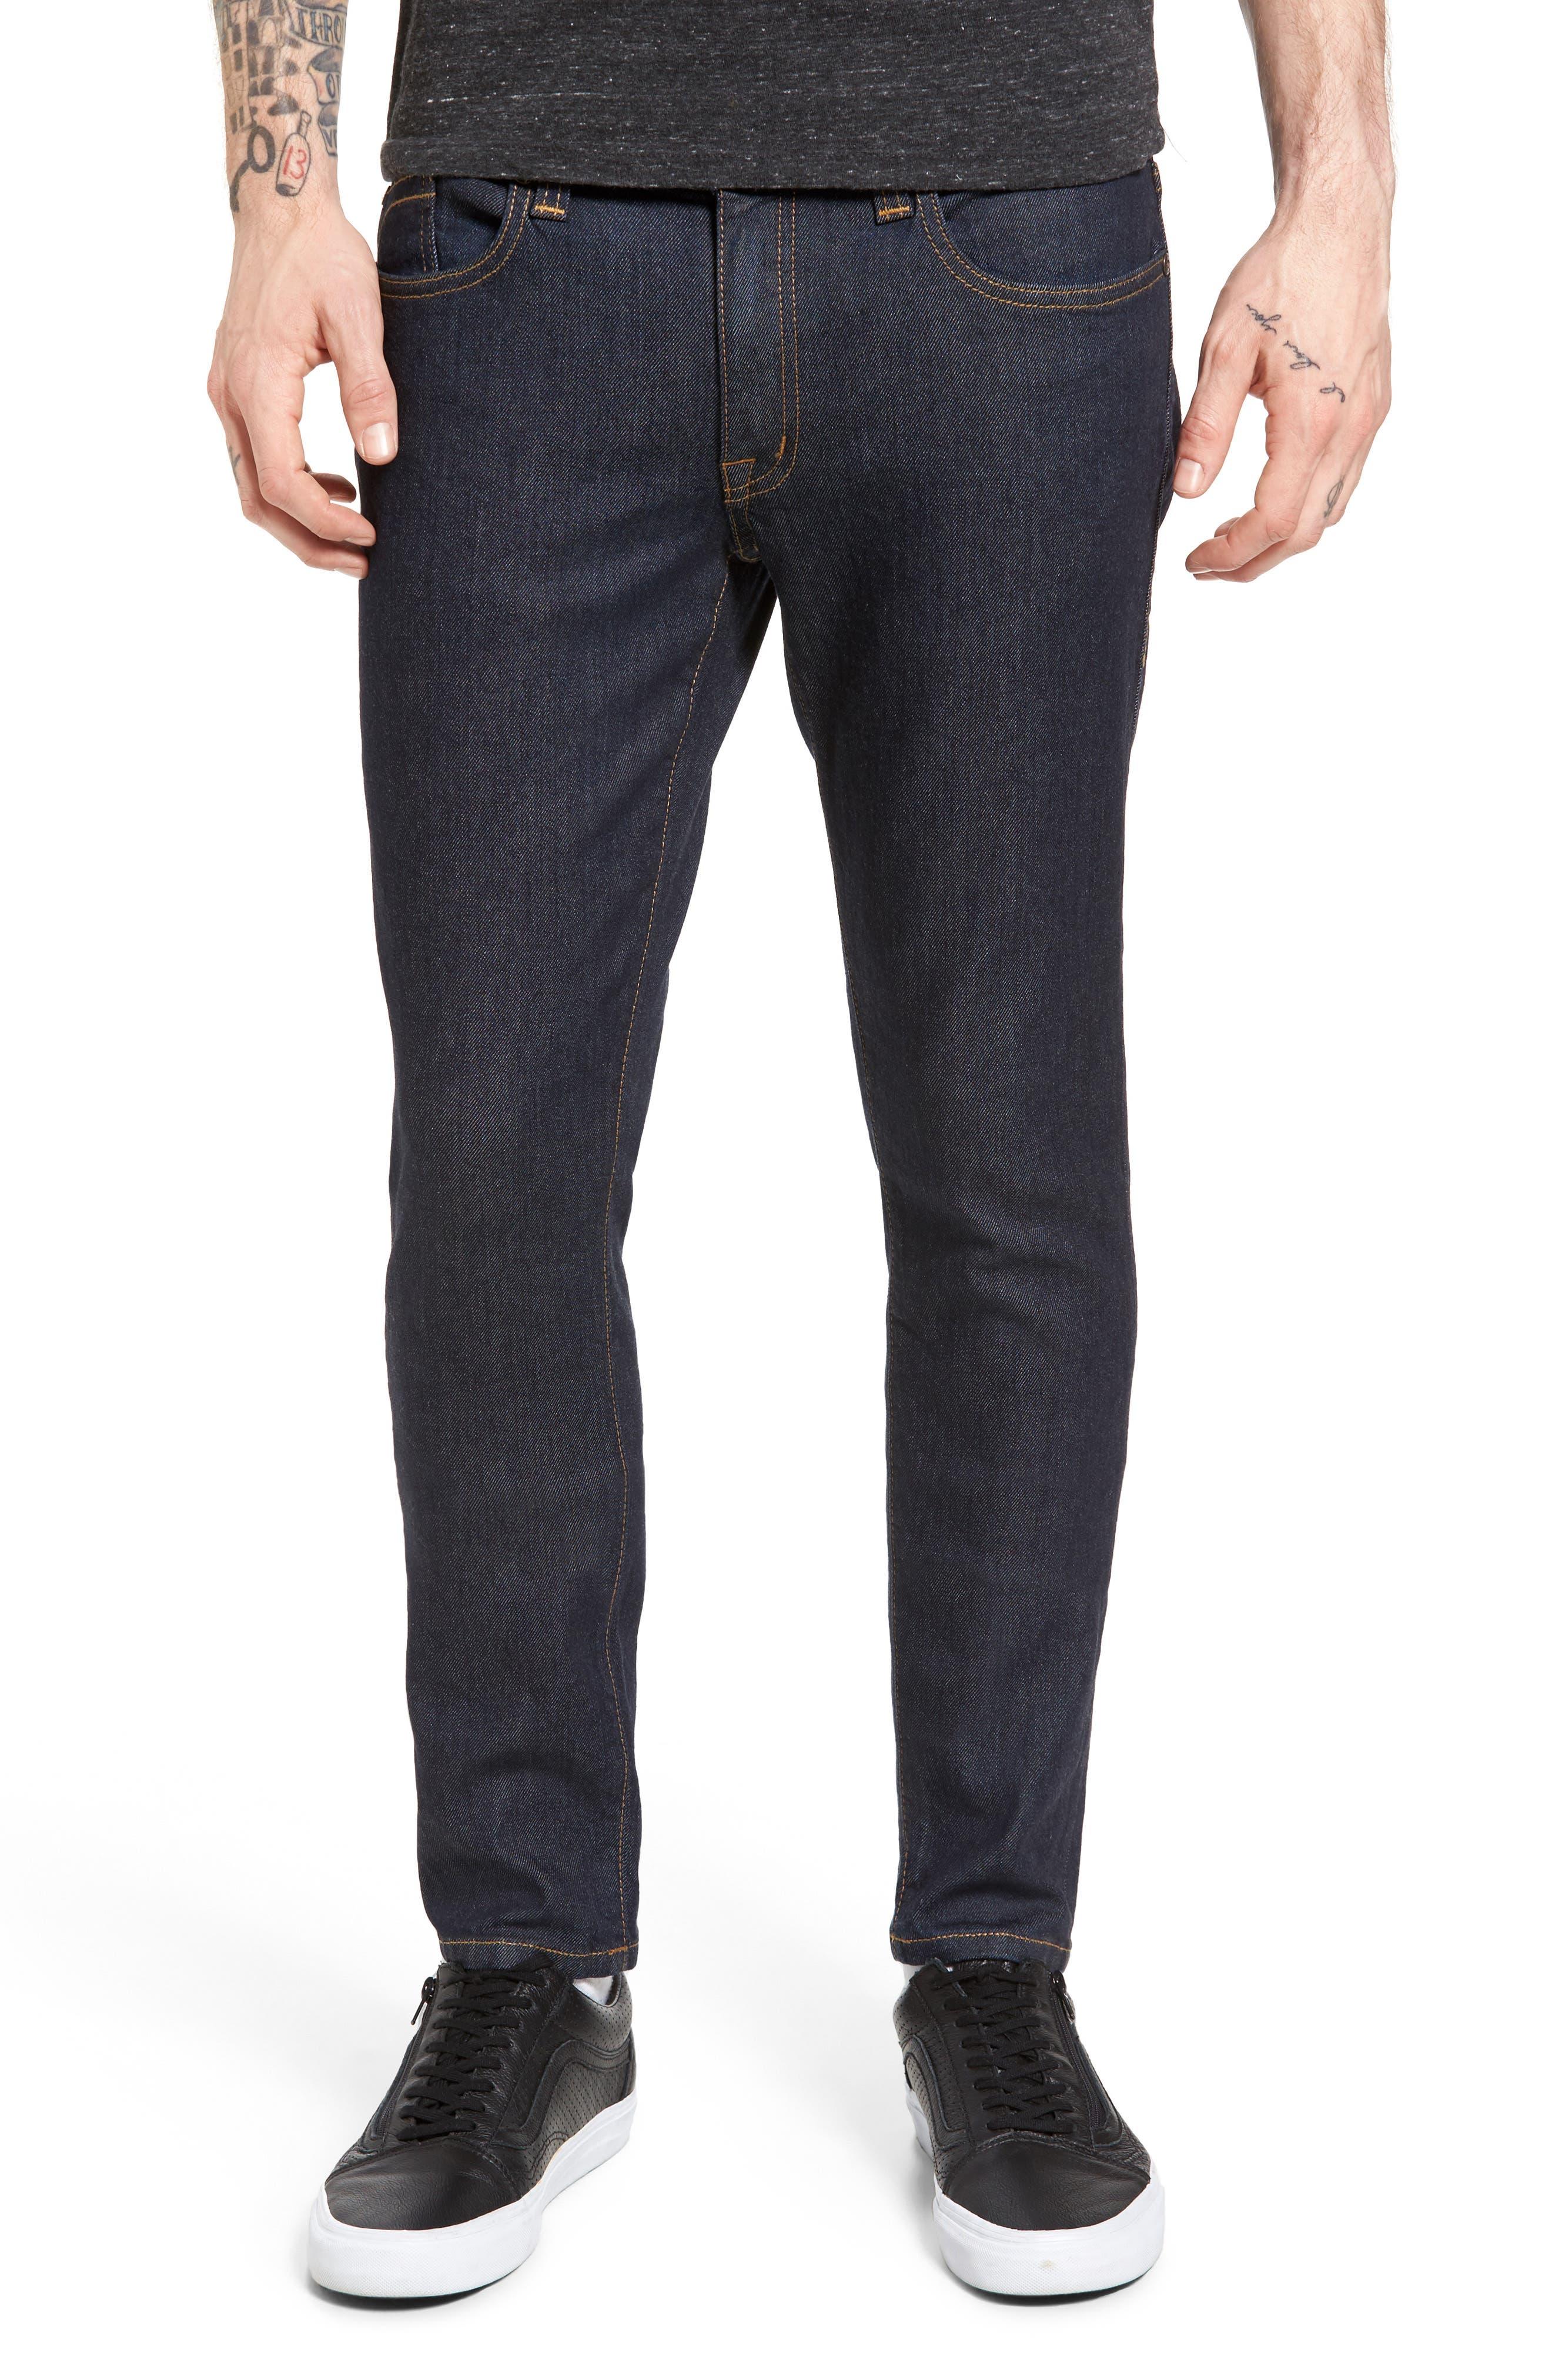 Vantage Skinny Fit Jeans,                             Alternate thumbnail 2, color,